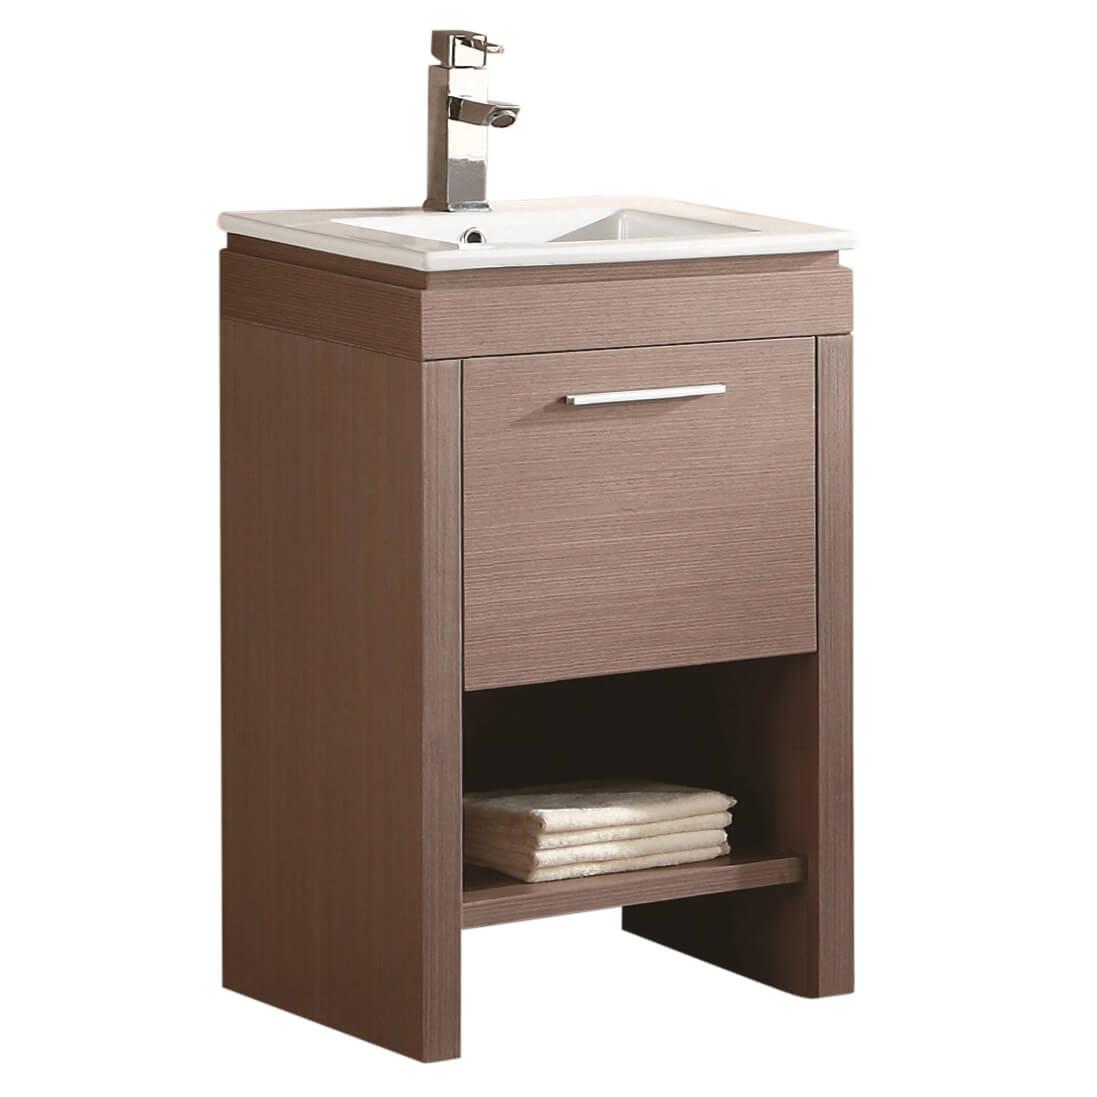 "Modena 24"" Modern Bathroom Vanity  Gray Oak"